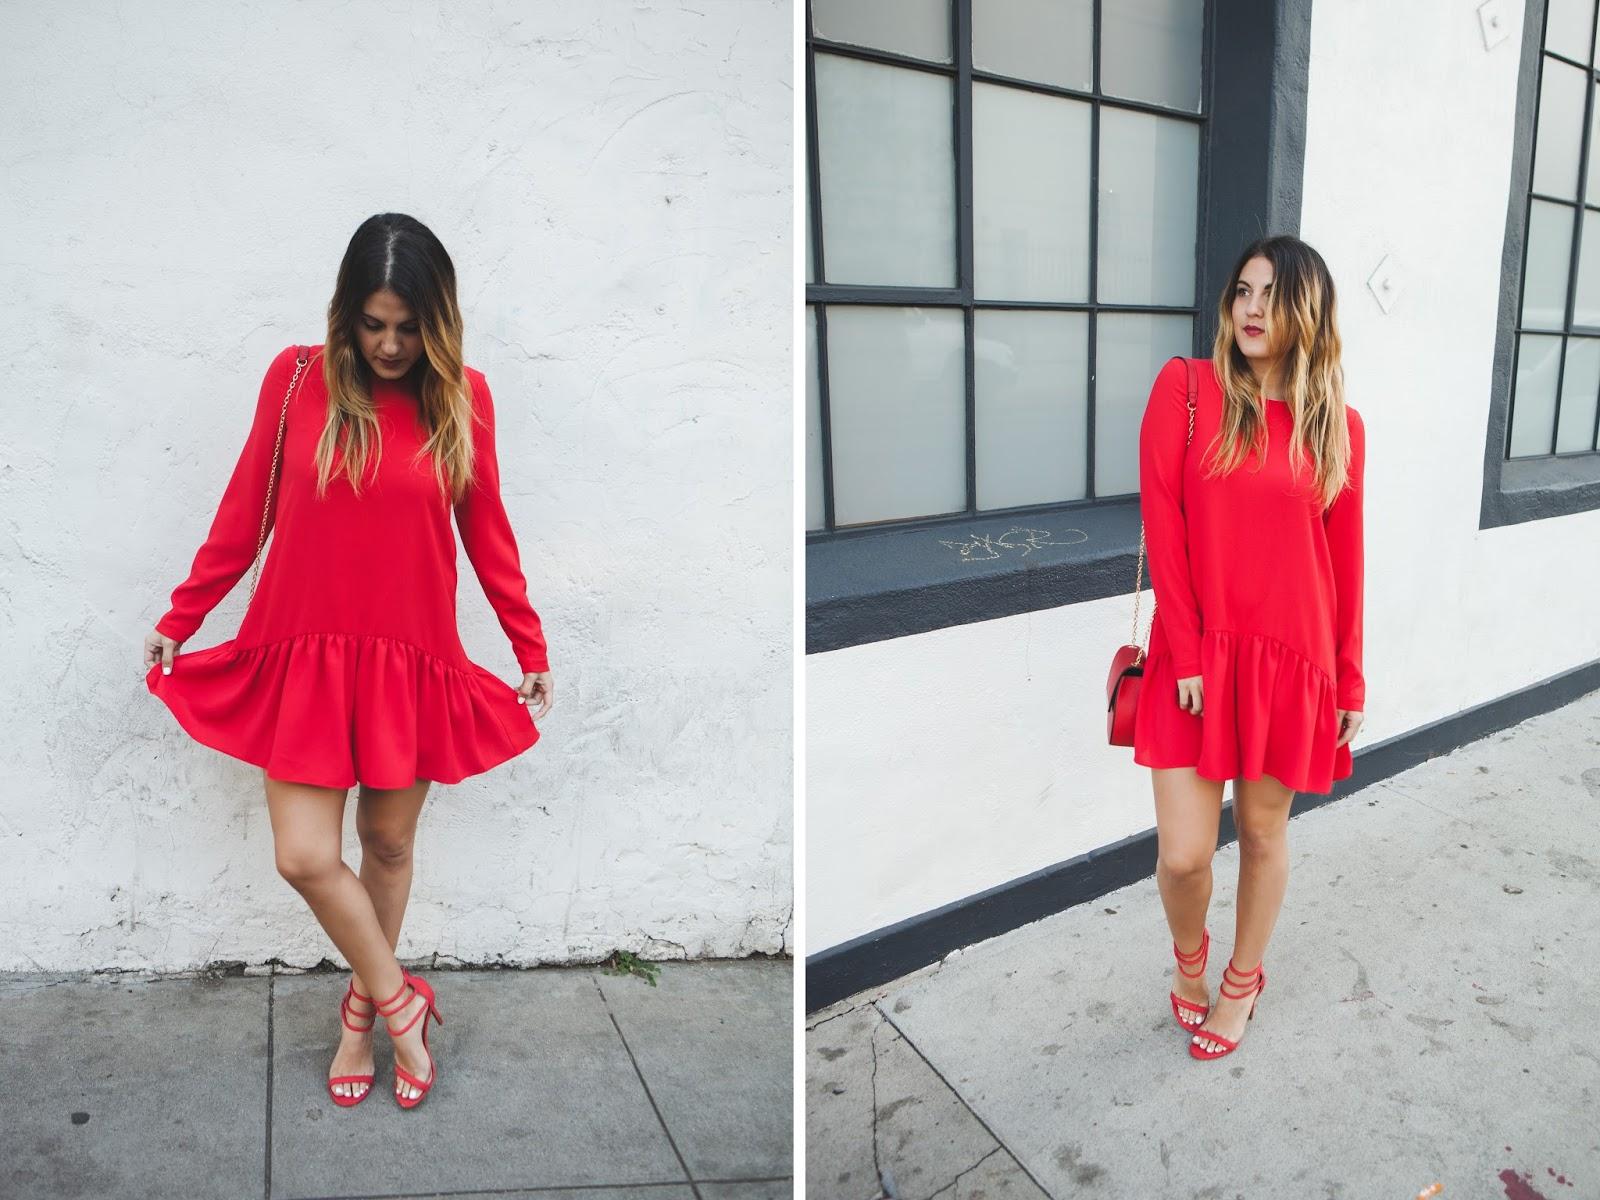 LA Fashion Blogger -- Taylor Winkelmeyer